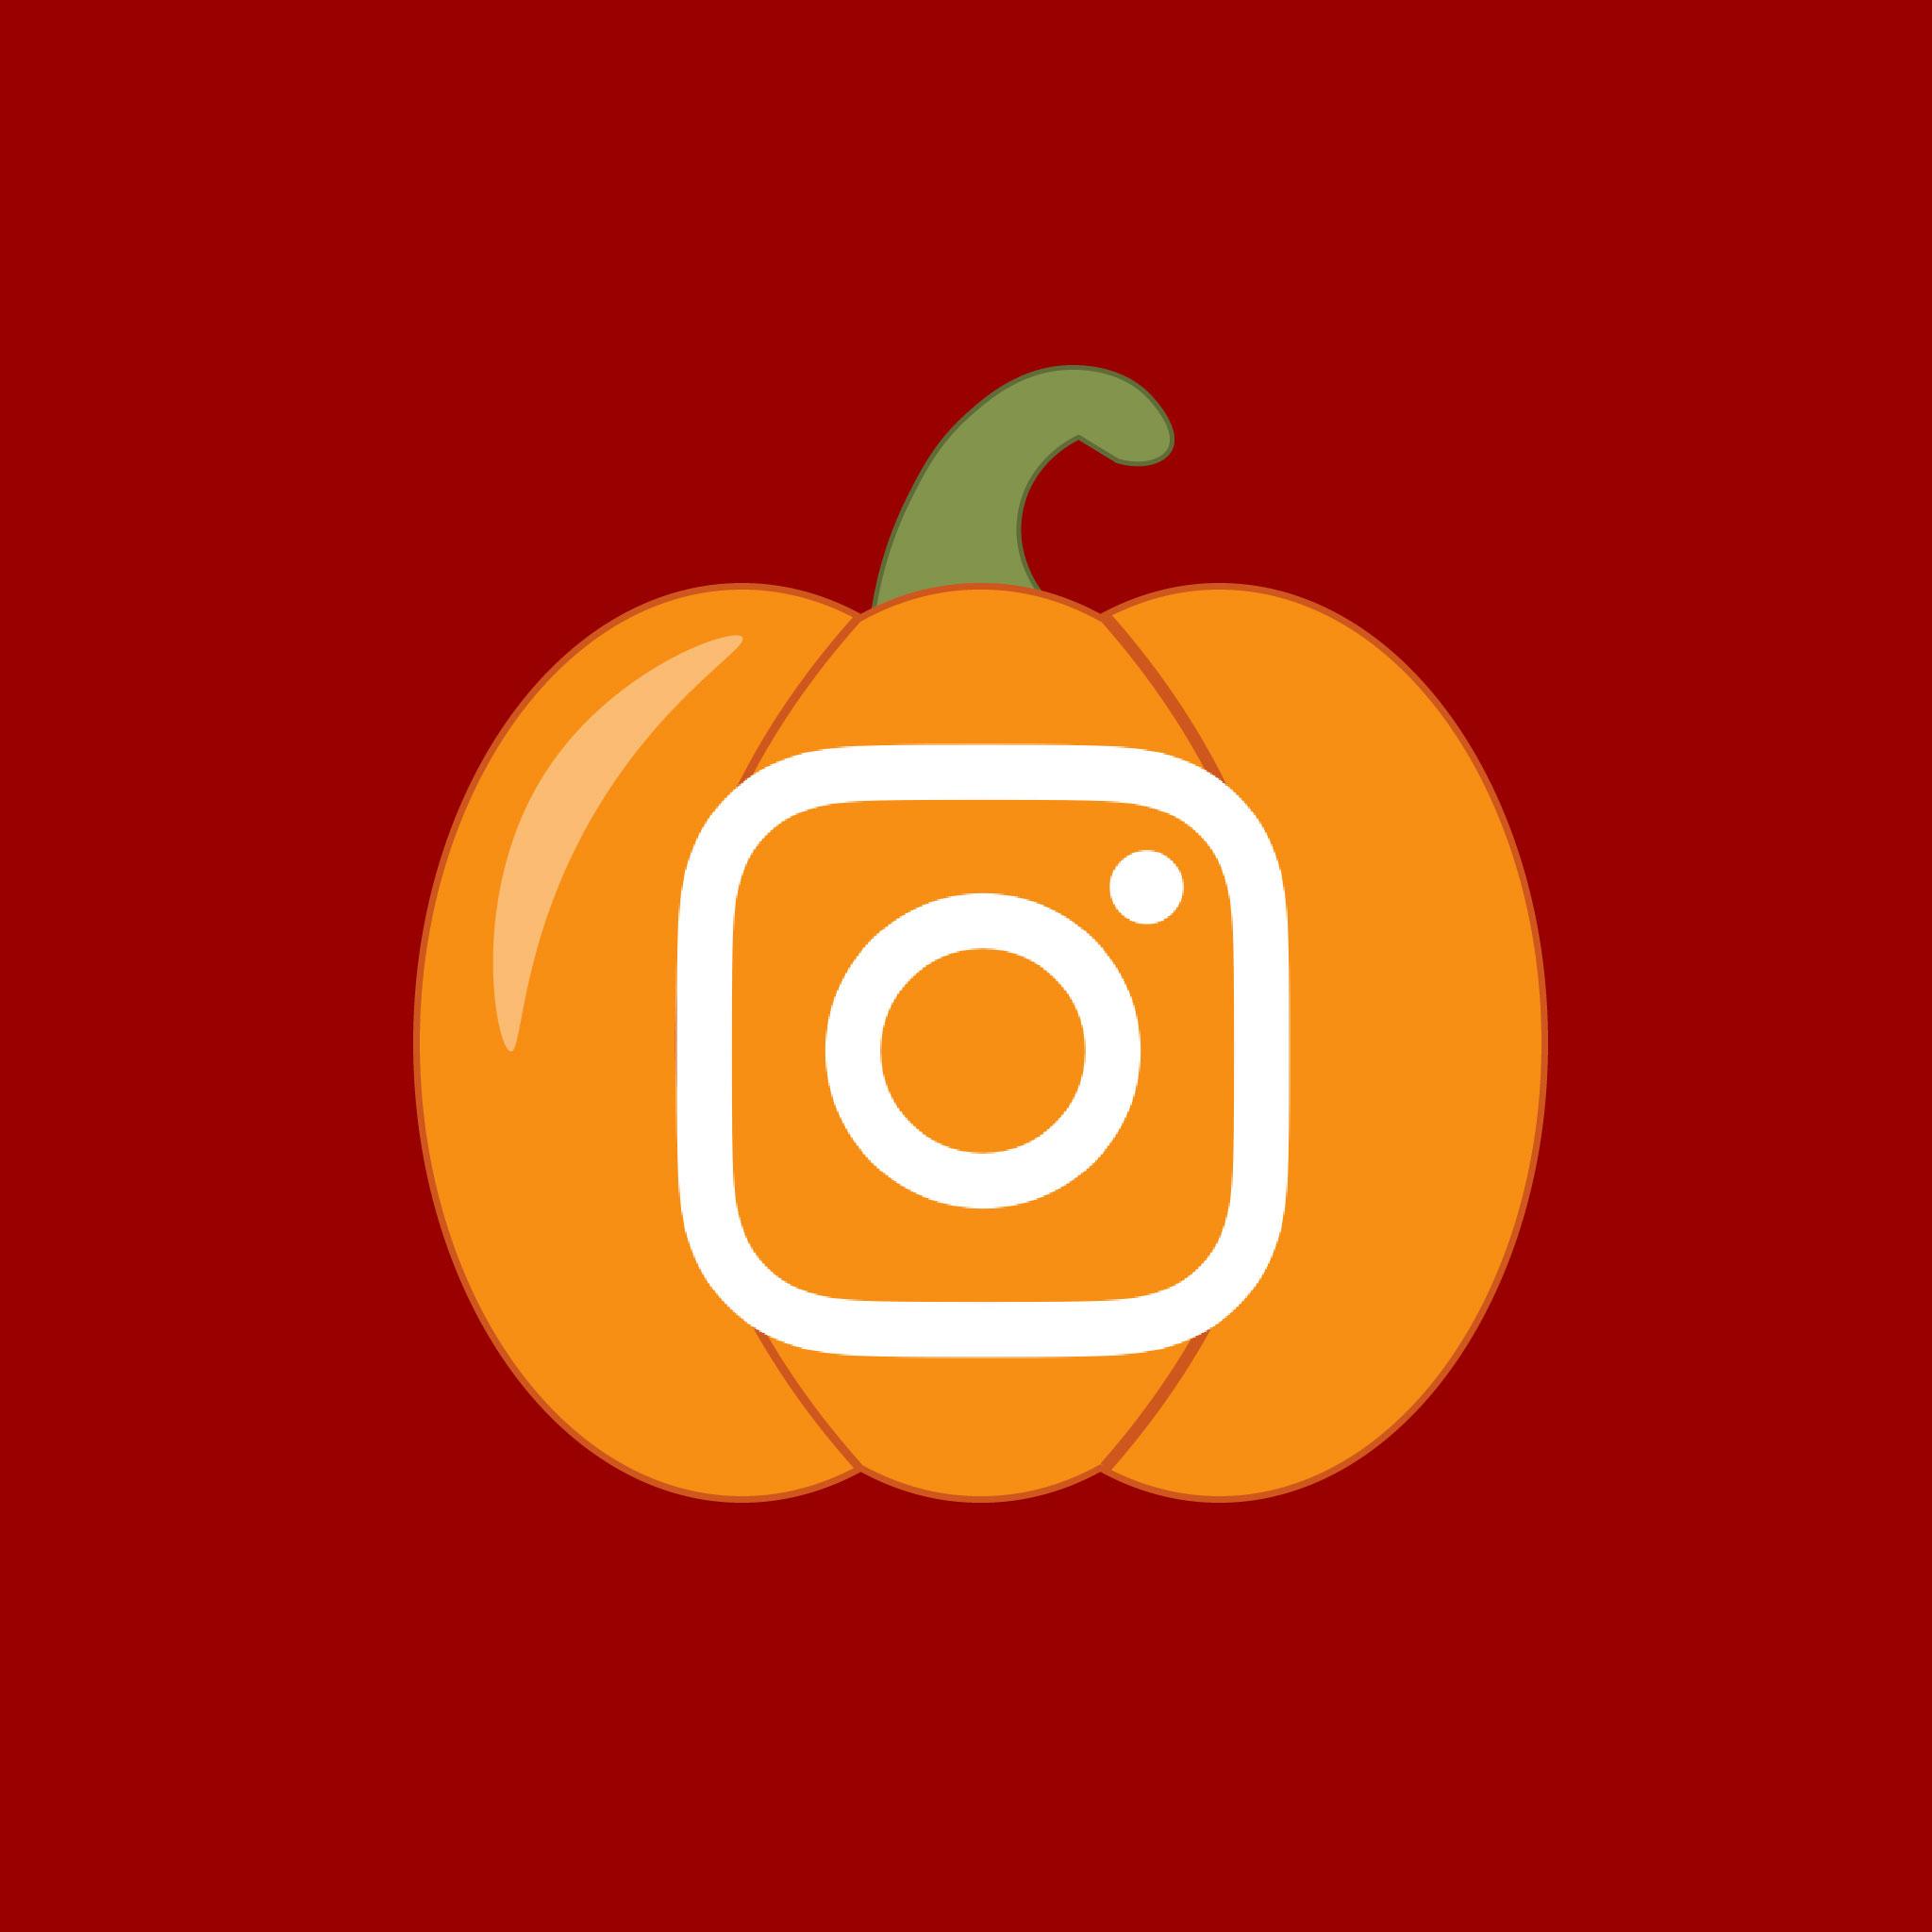 Instagram Halloween App Icon from HalloweenCostumes.com